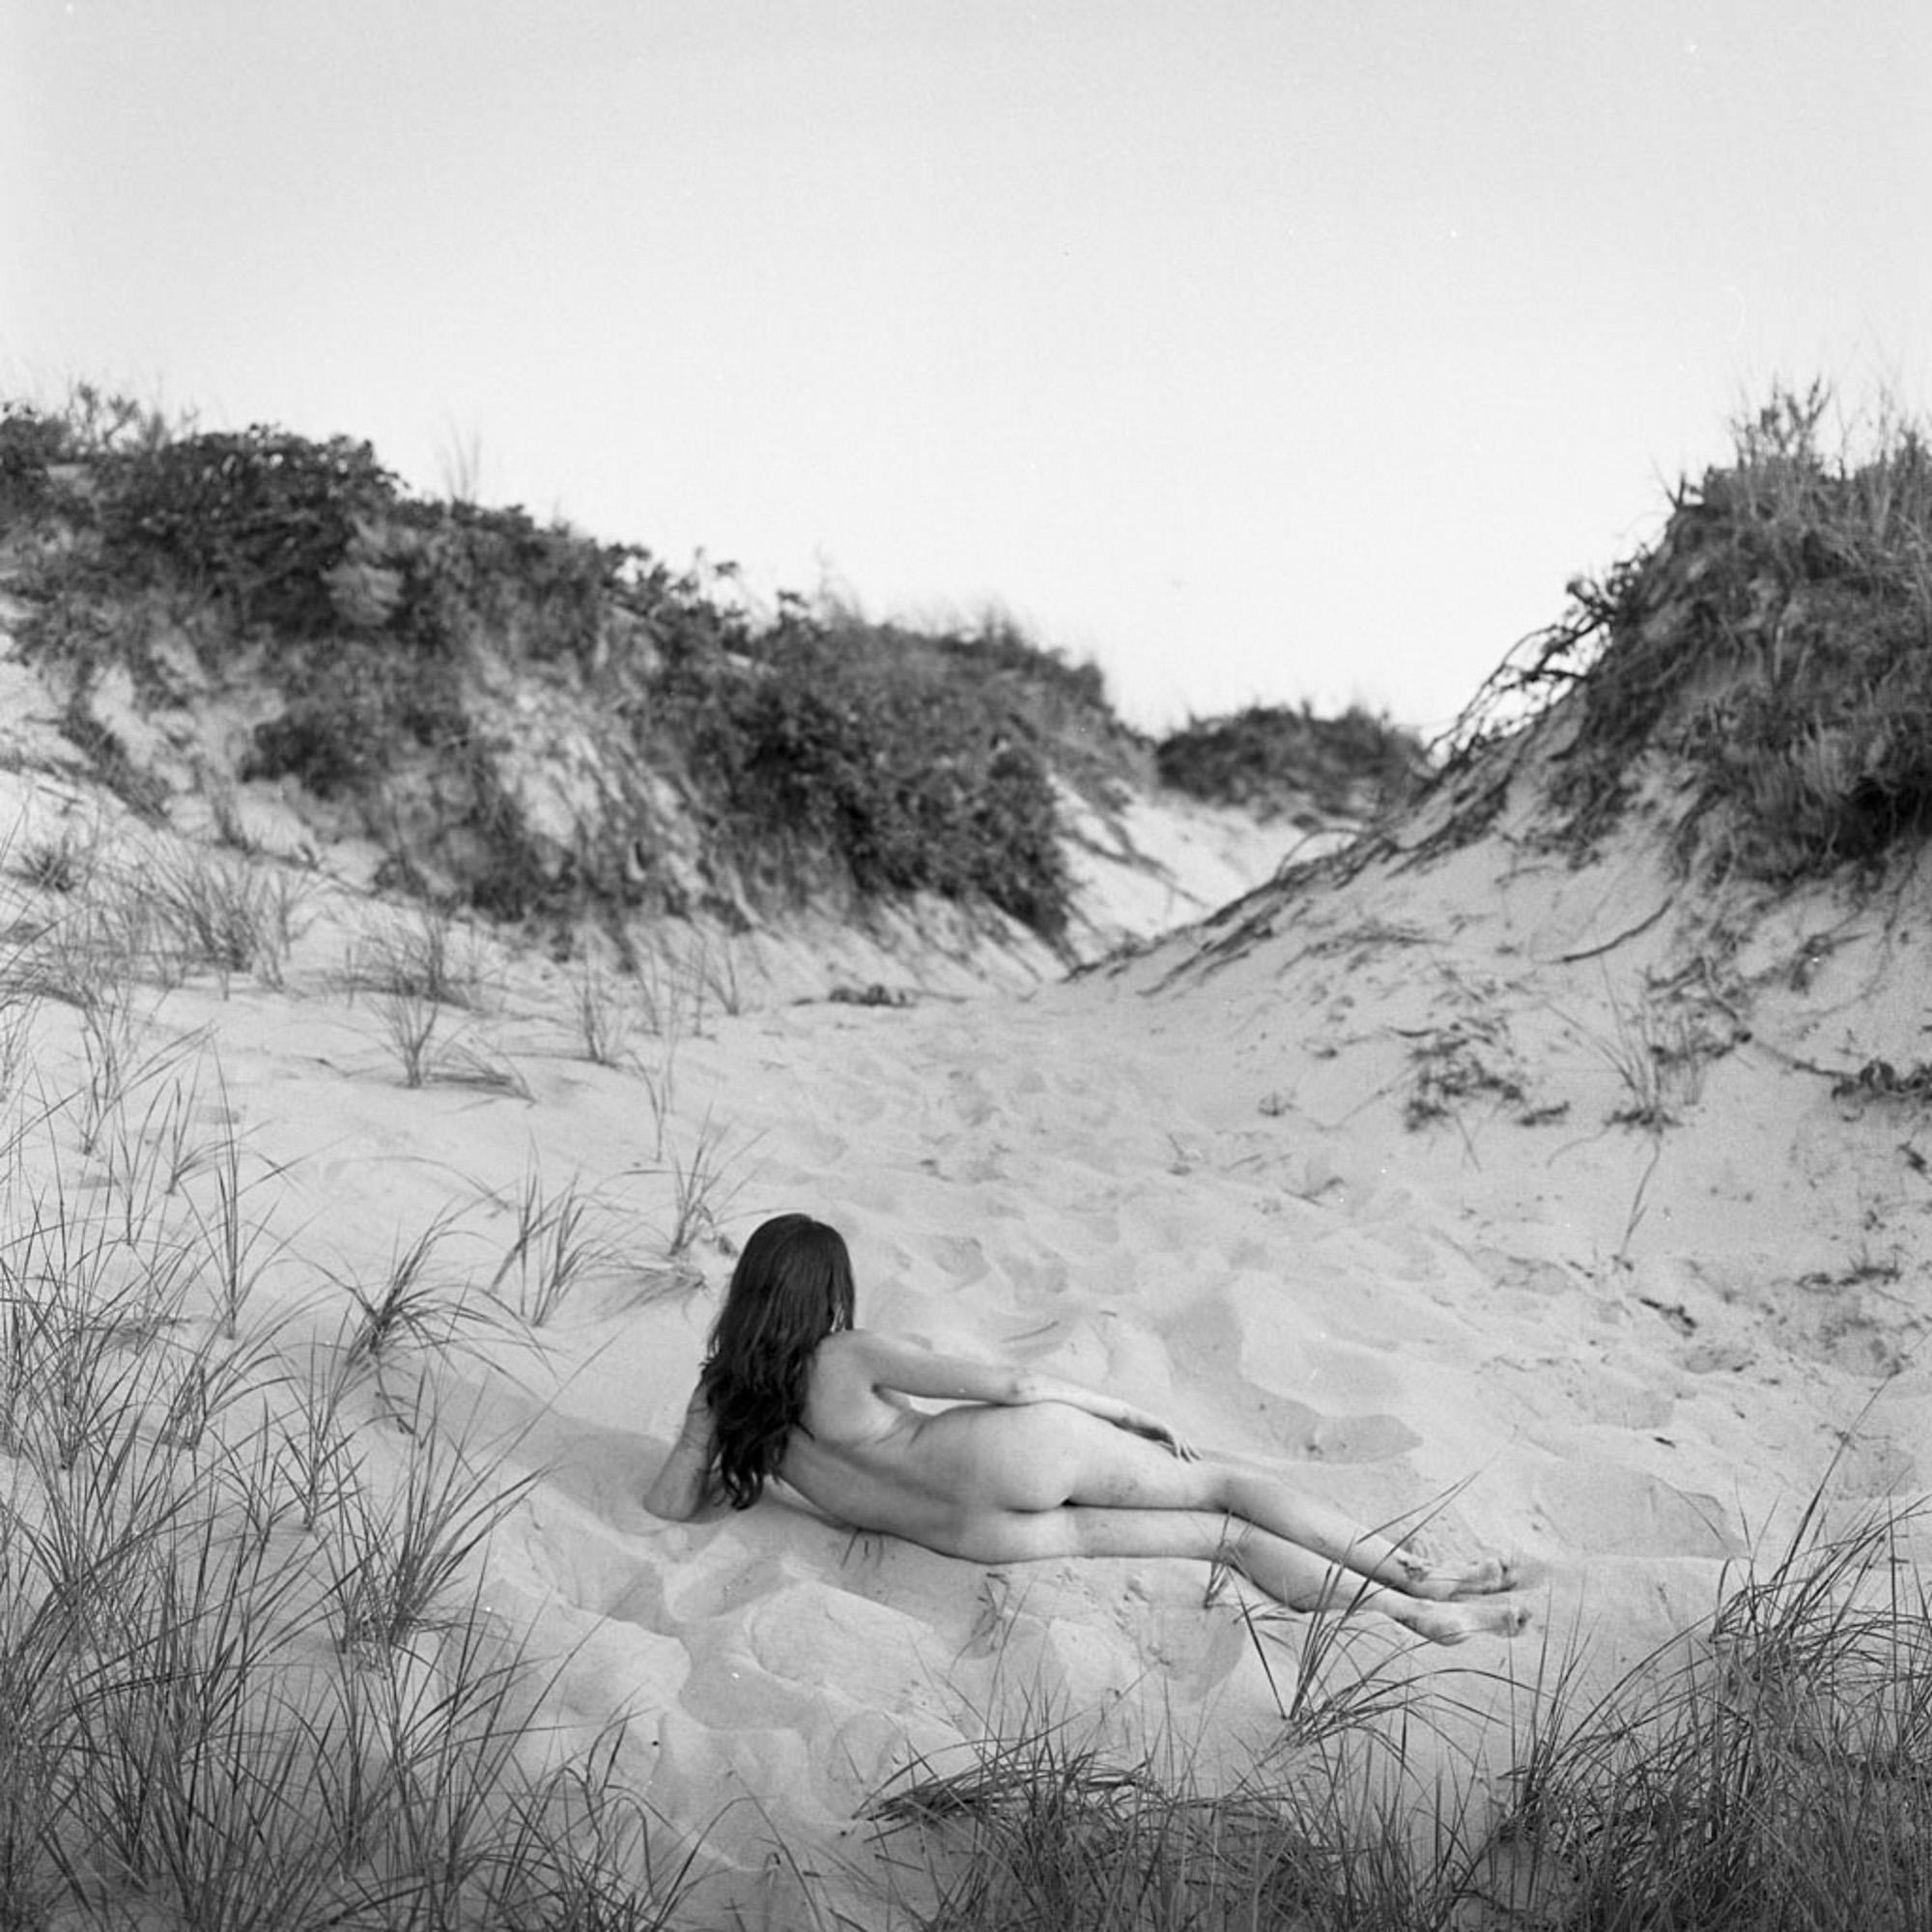 Henrikson Archive Nudes web.jpg